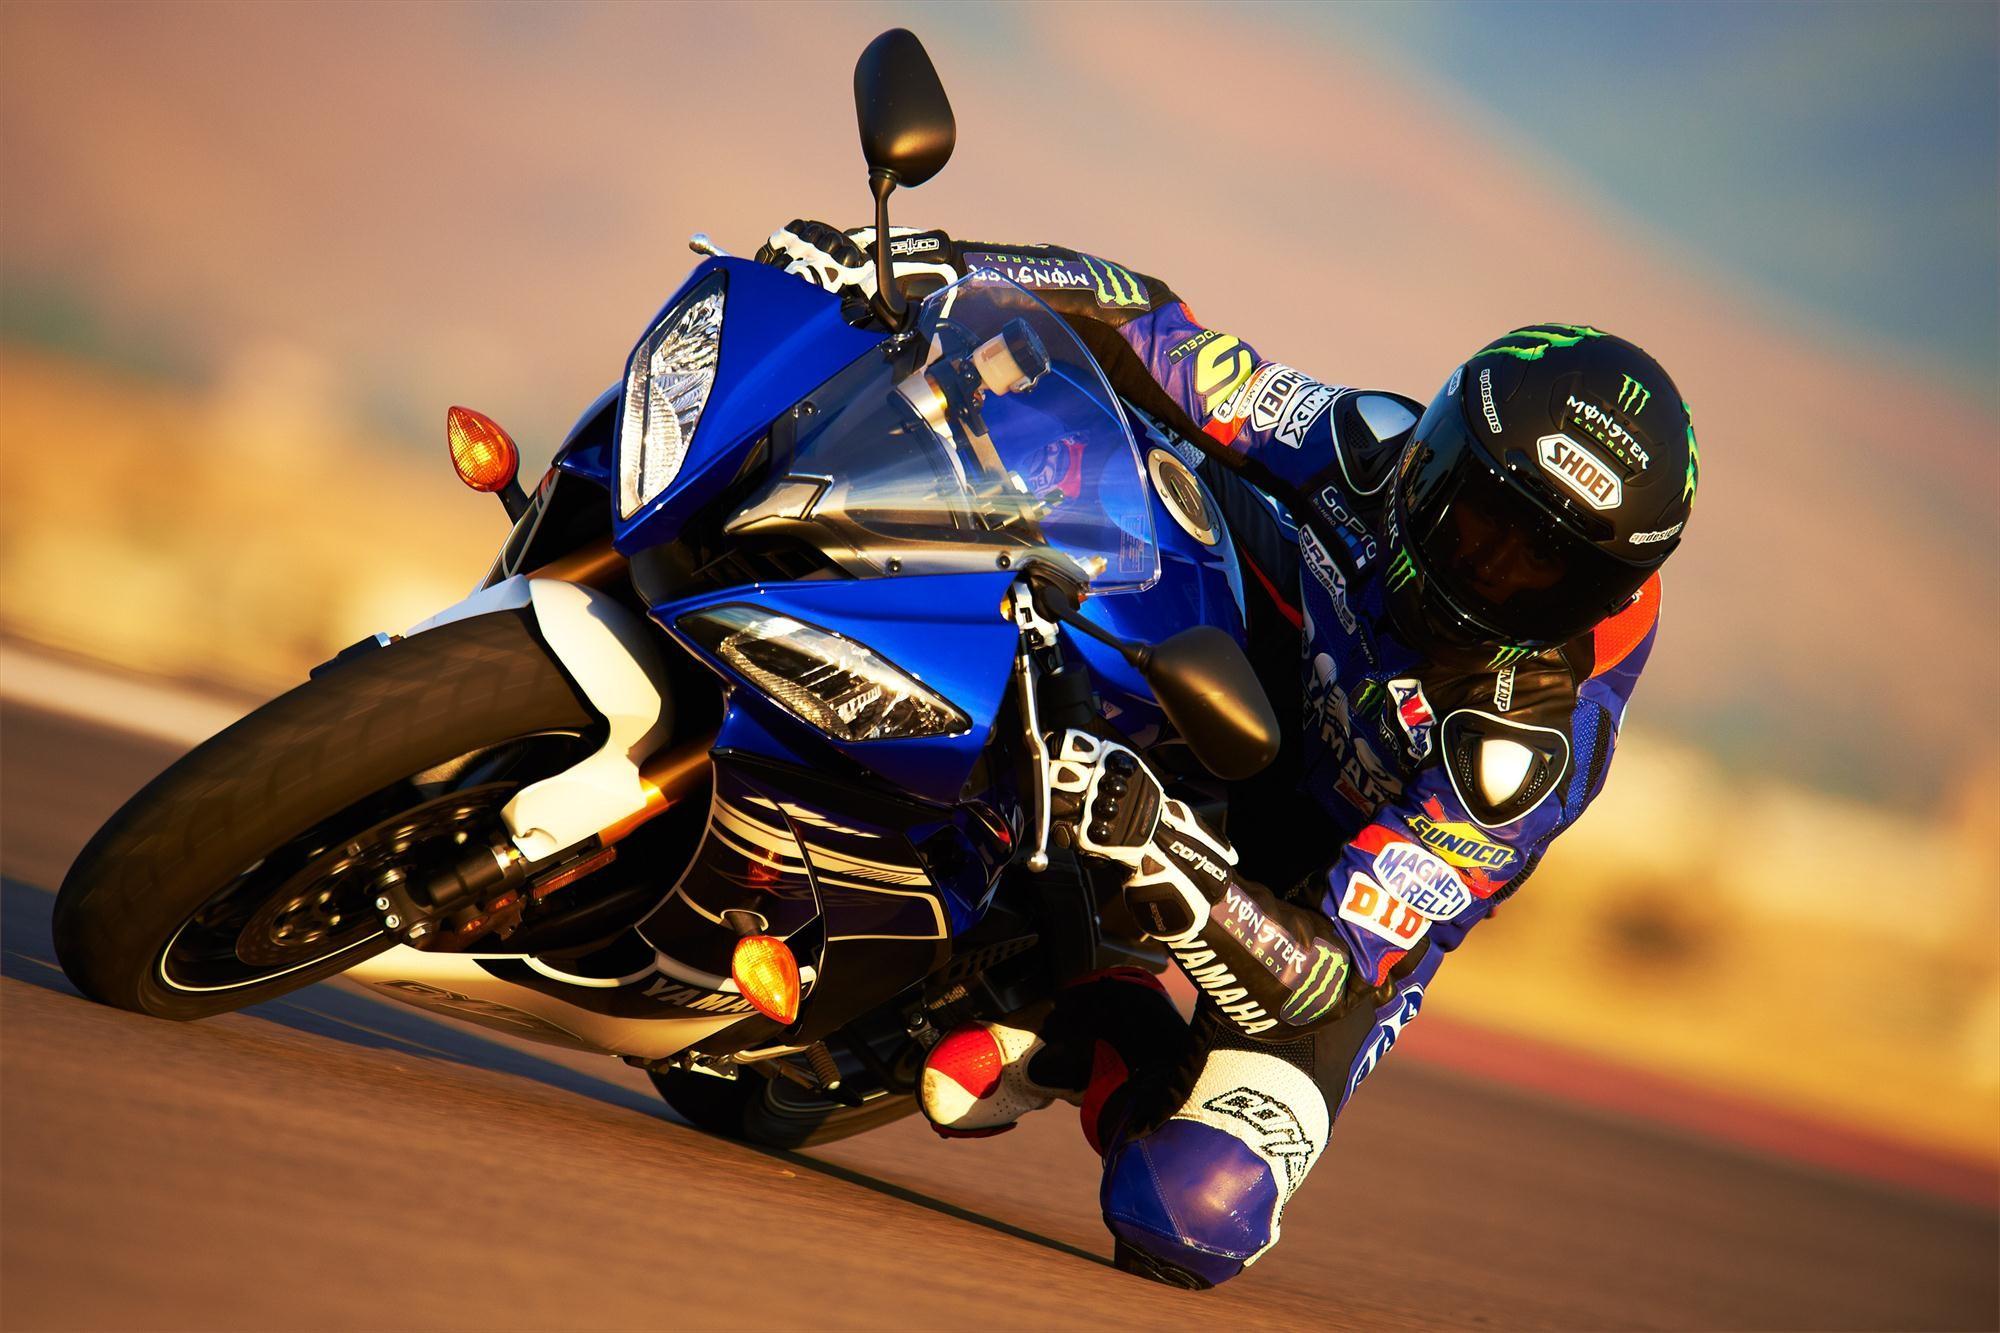 2015 Yamaha R6 Wallpaper Full HD #22744 New Trend elthing.com | Download  Wallpaper | Pinterest | Hd wallpaper and Wallpaper